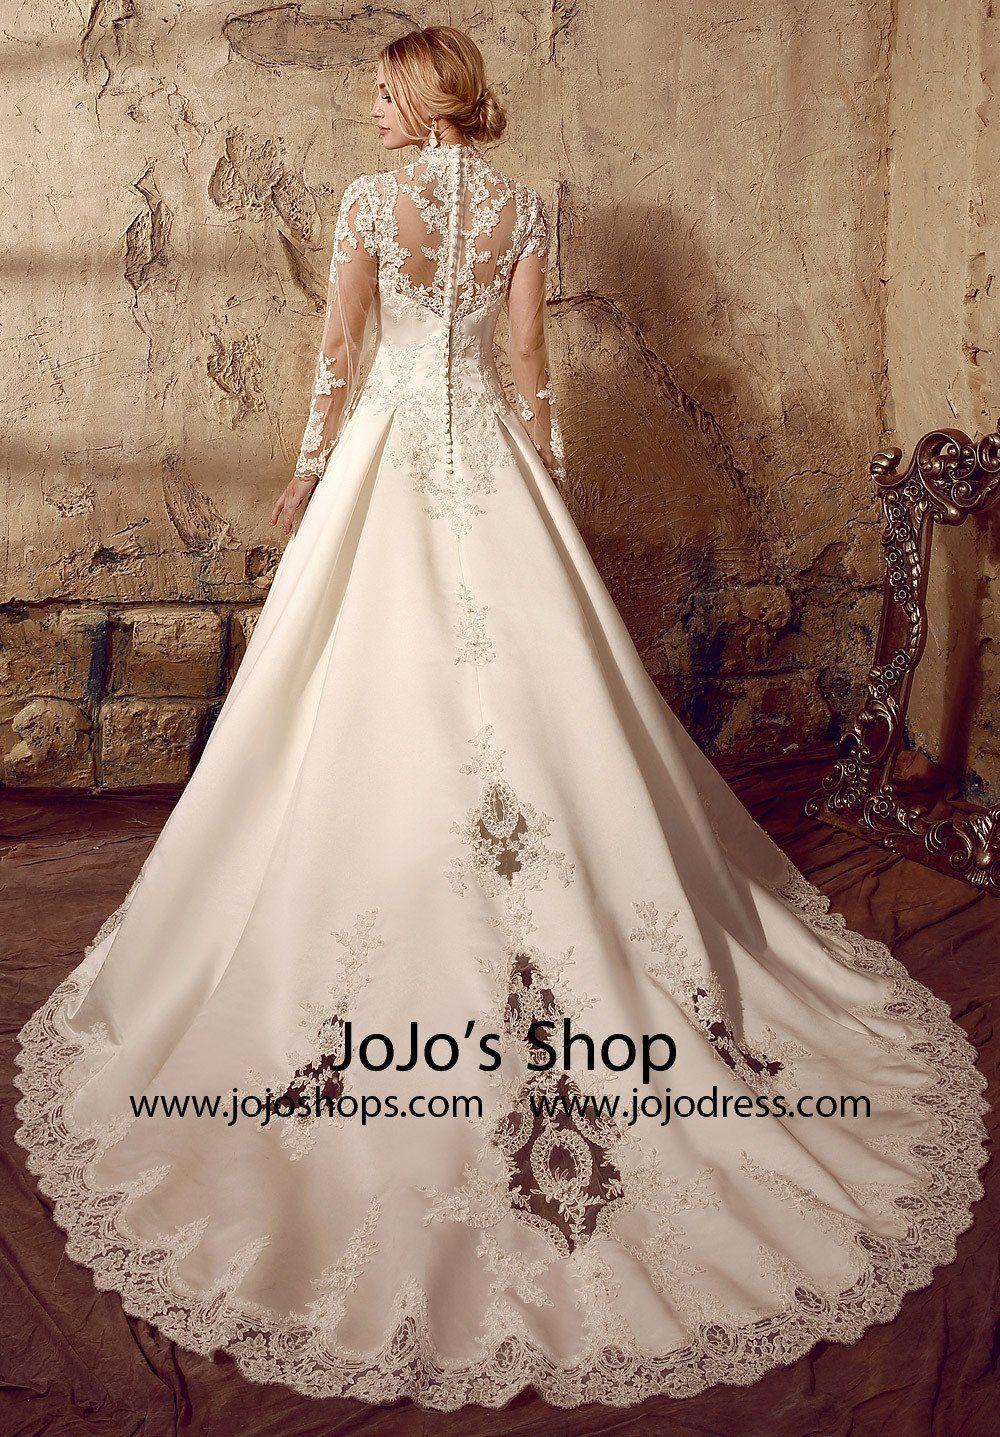 Modest long sleeve lace wedding dresses  Long Sleeves Victorian Style Modest Lace Wedding Dress  Lace ball